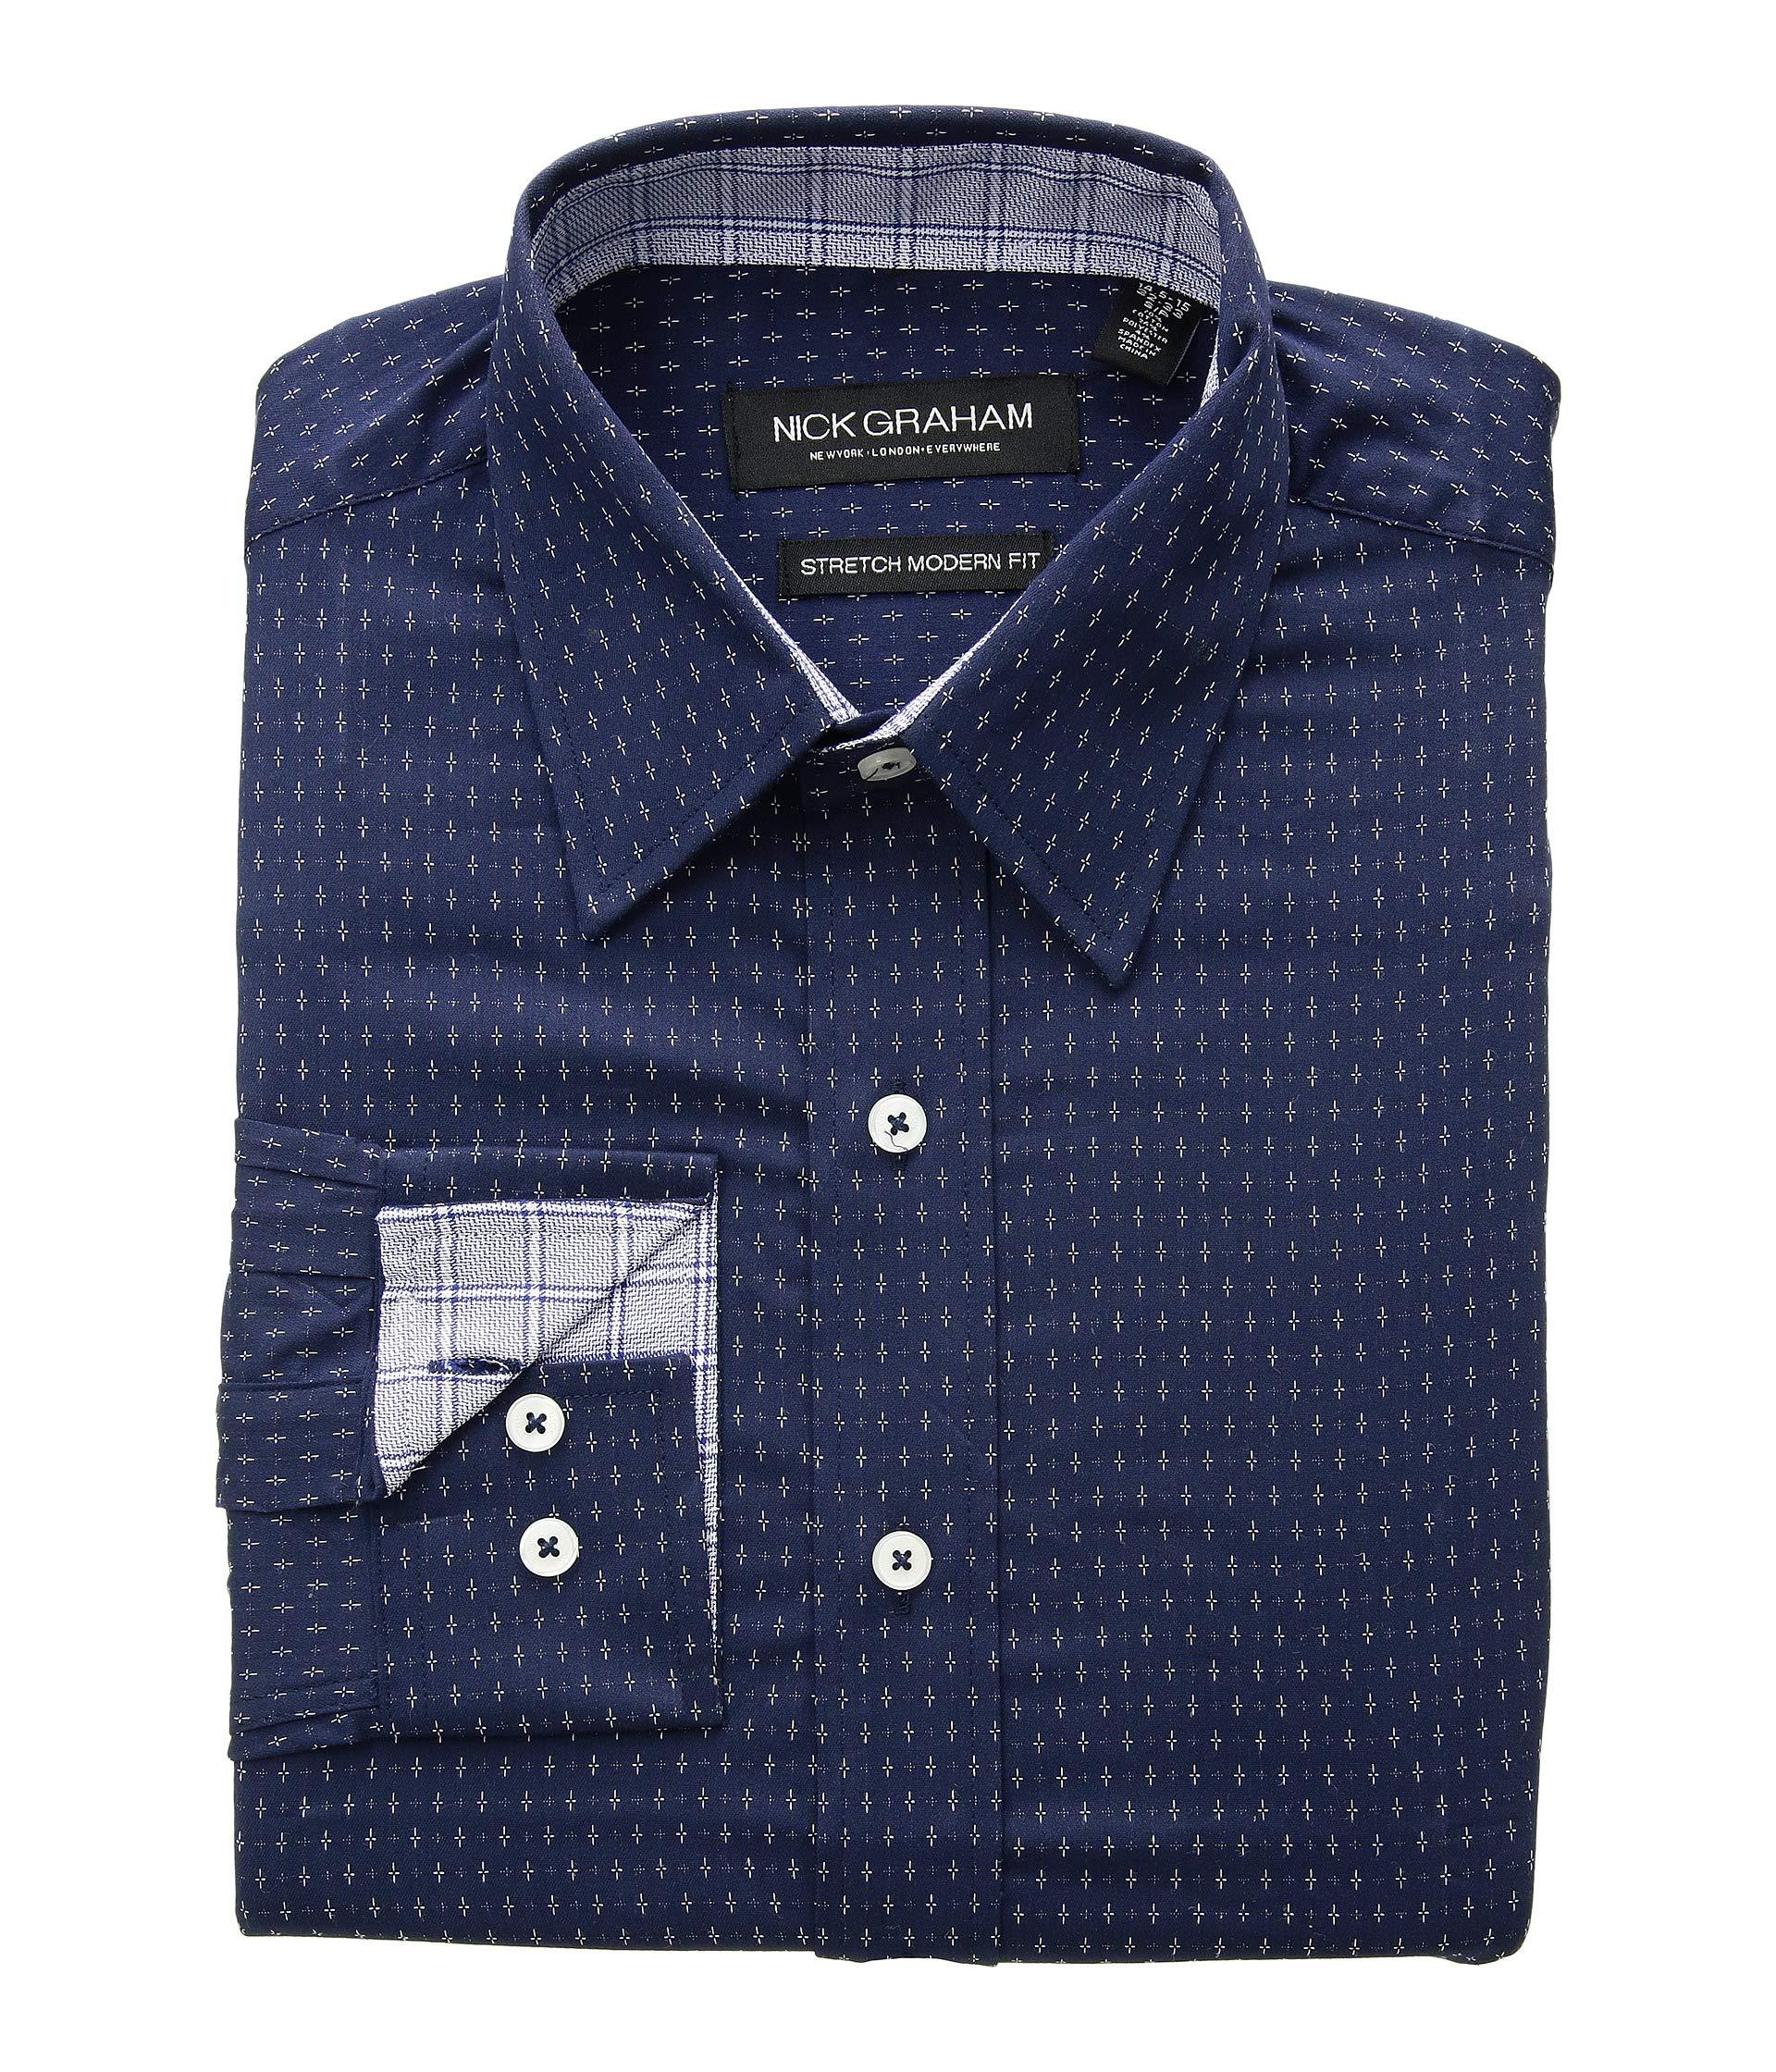 Navy Cvc Cross Dress Shirt Print Graham Stretch Nick Dot wAz8qAT